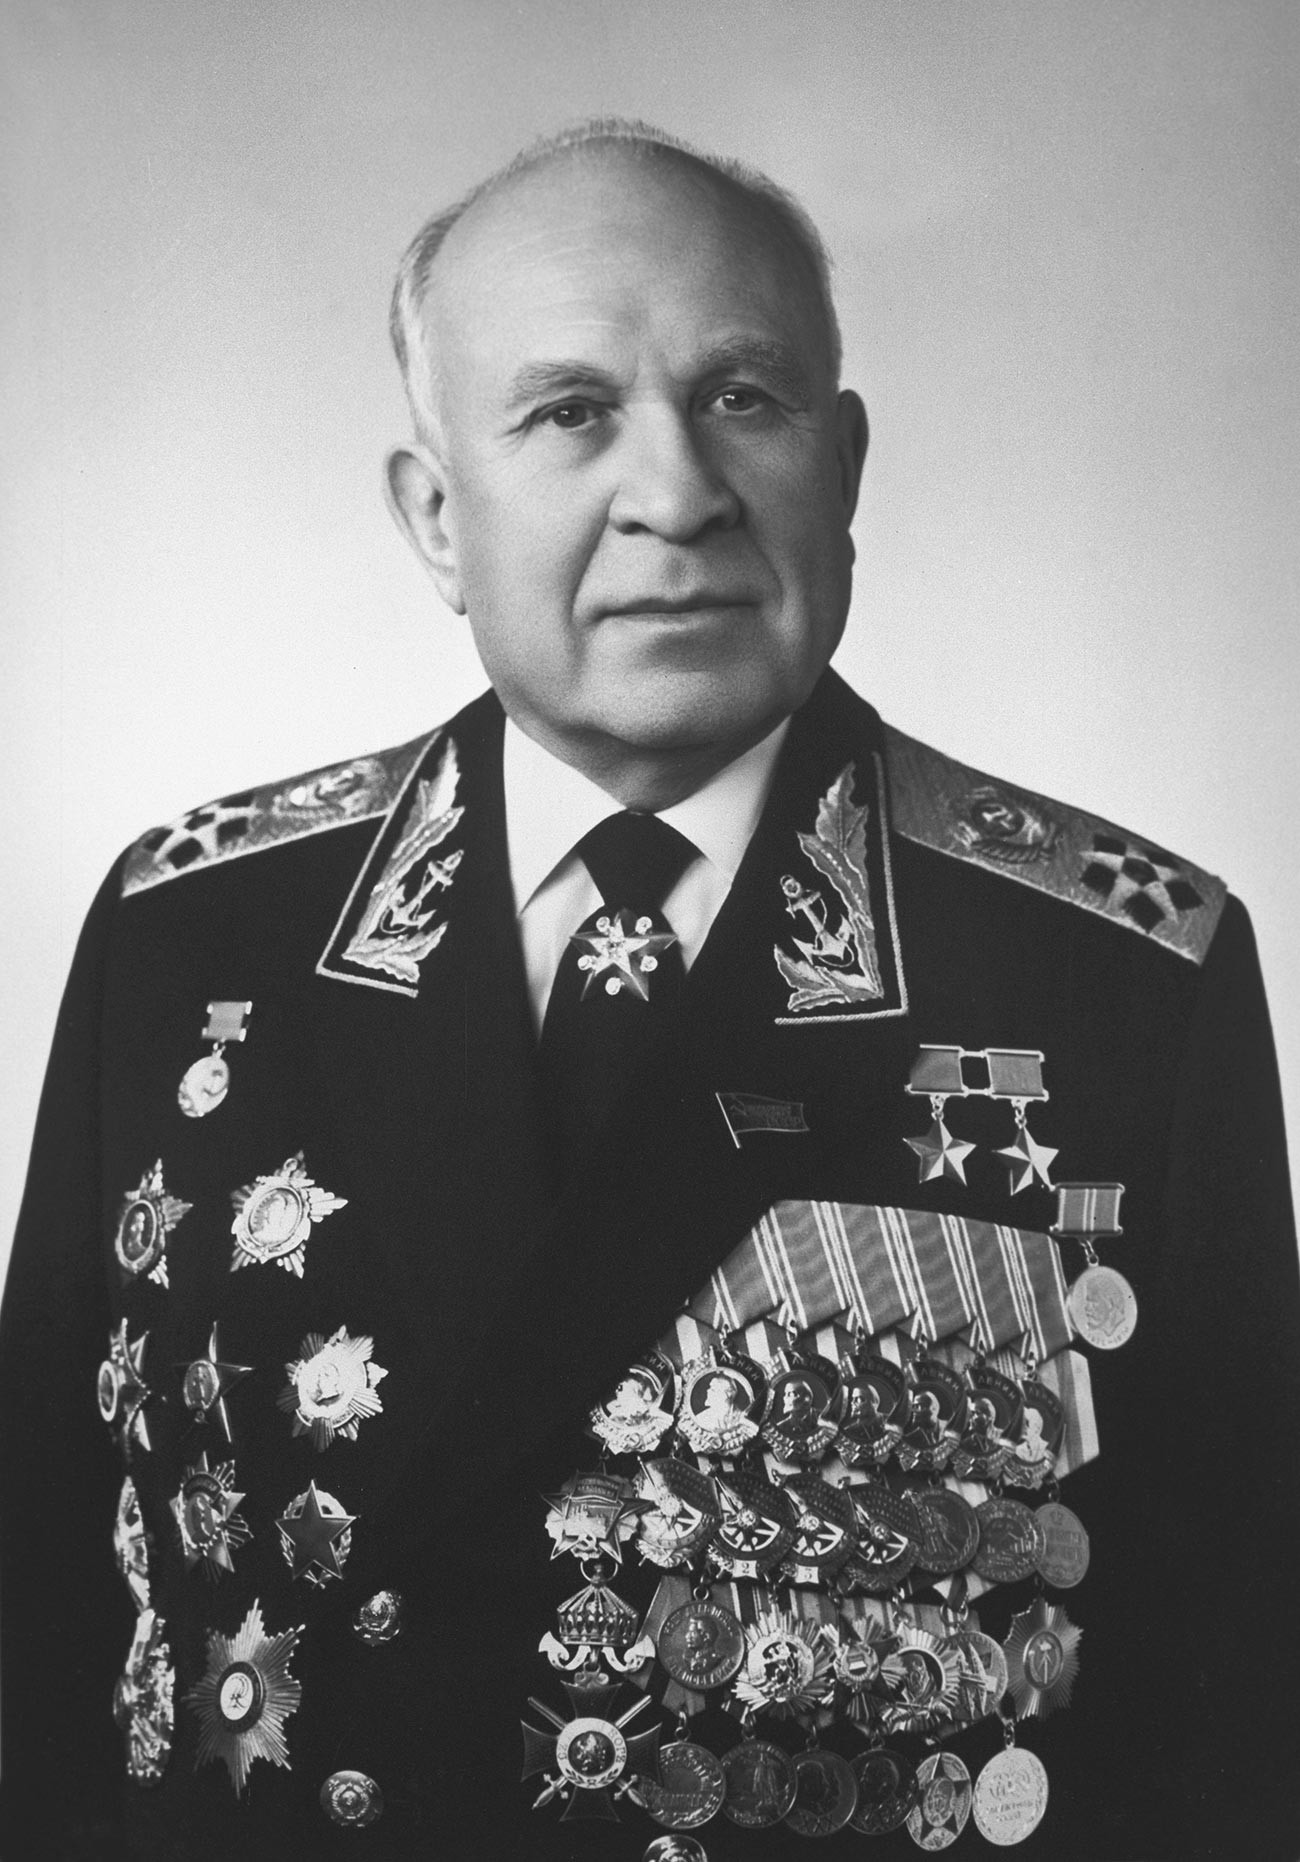 Адмирал флоте Совјетског Савеза, двоструки Херој Совјетског Савеза Сергеј Георгијевич Горшков.